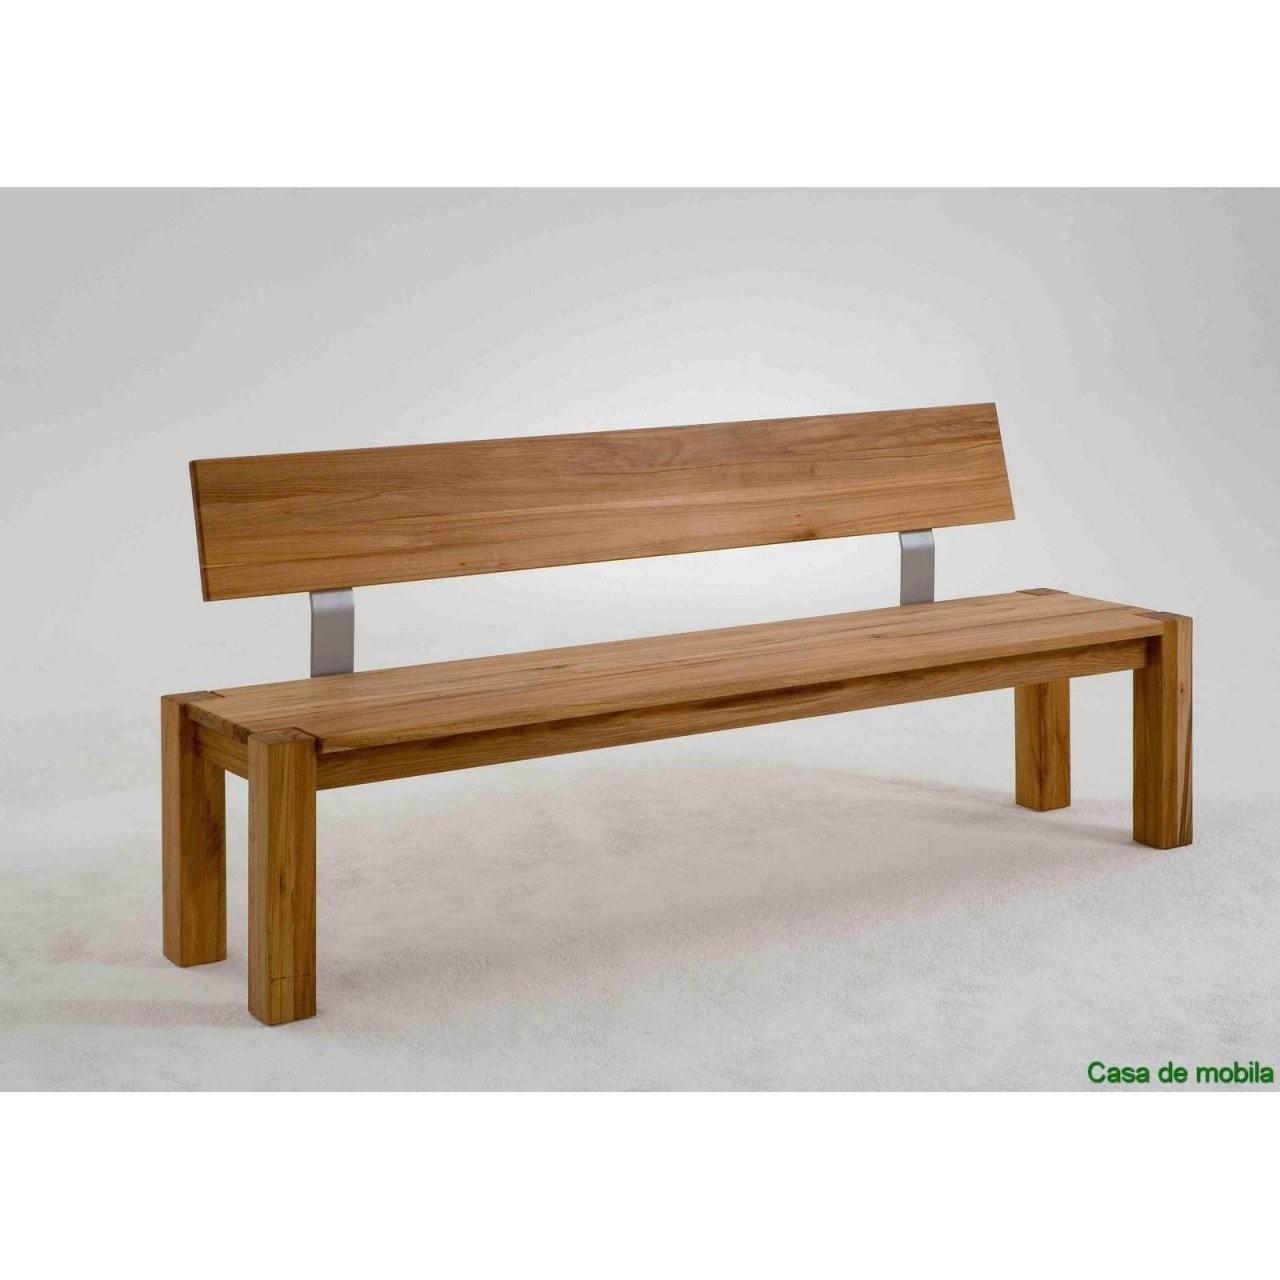 Tolle Sitzbank Massivholz Mit Lehne  Beautiful Benches  Sitzbank von Weiße Sitzbank Mit Lehne Photo